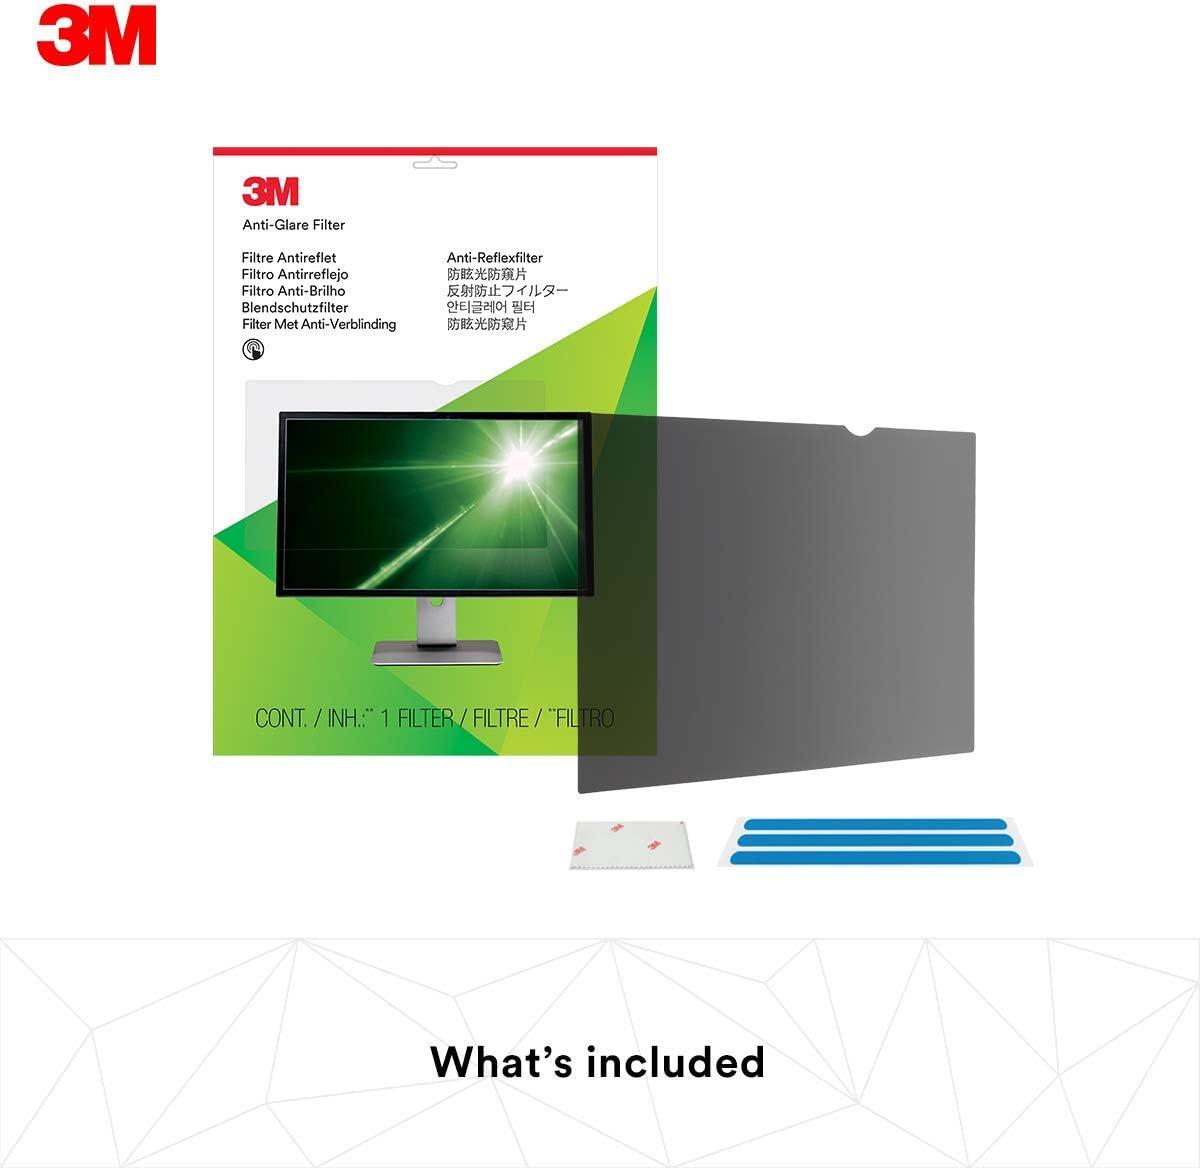 3M Anti-Glare Filter for 19